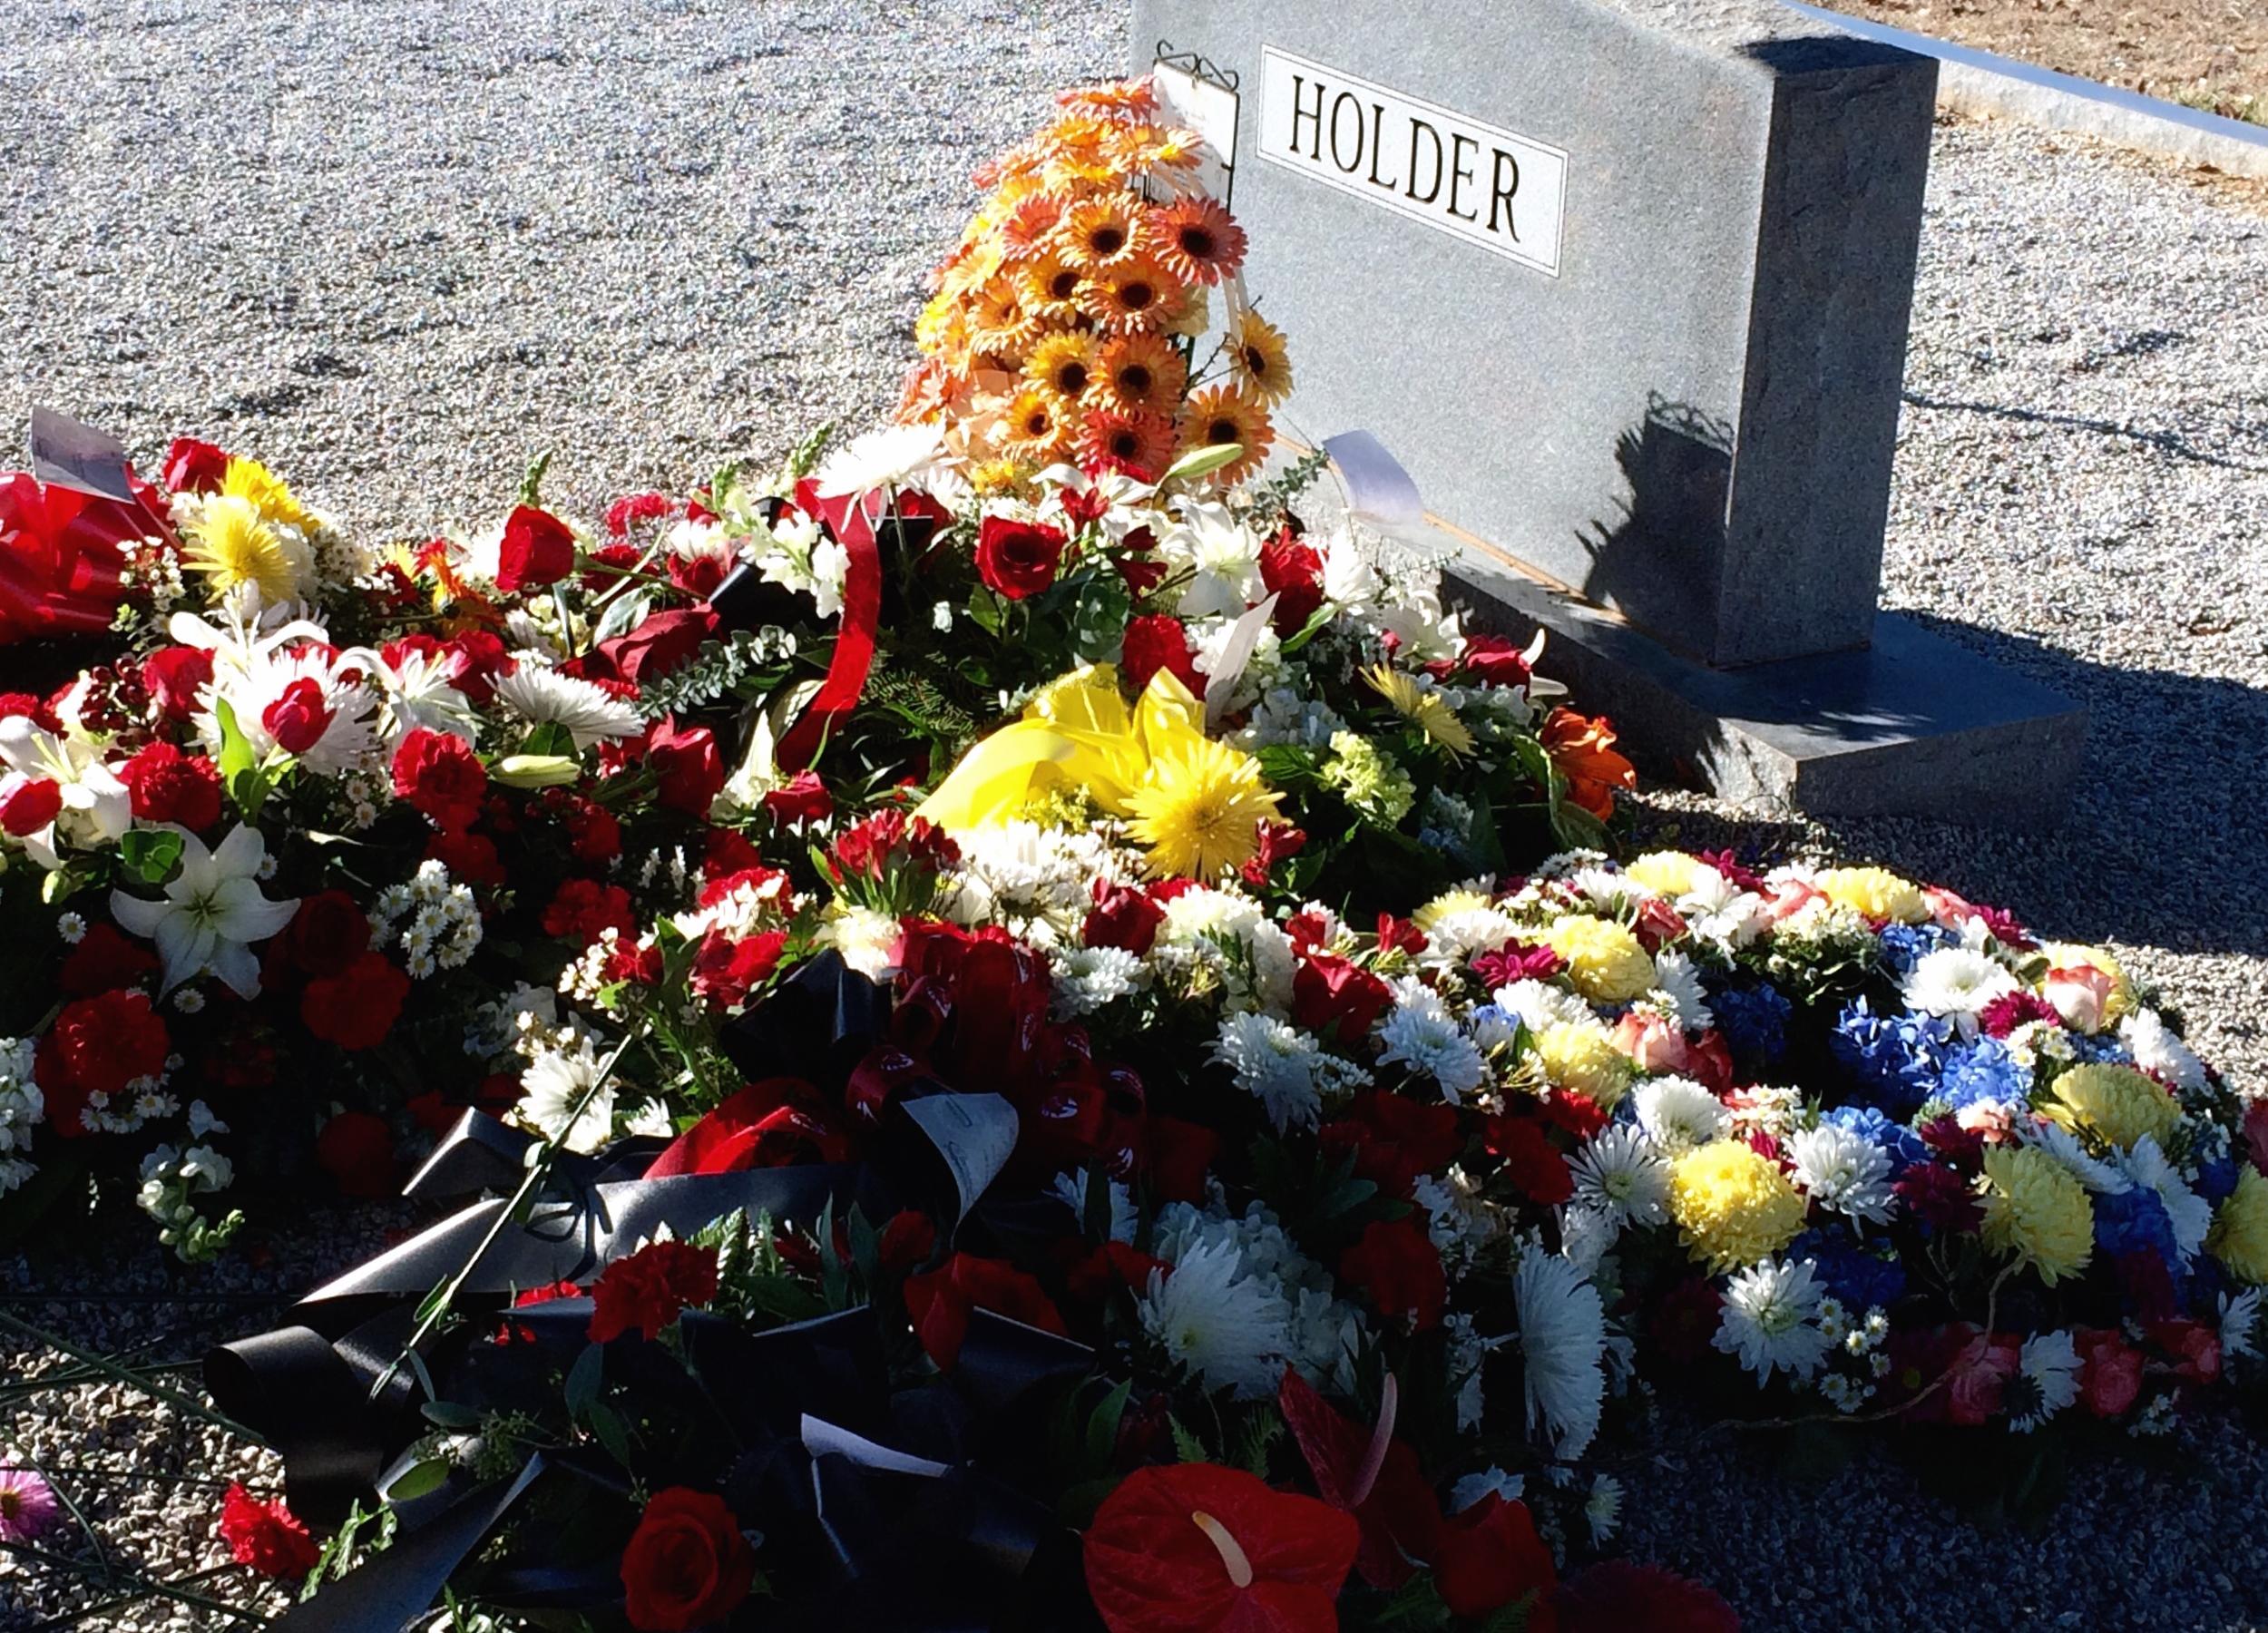 Holder Headstone